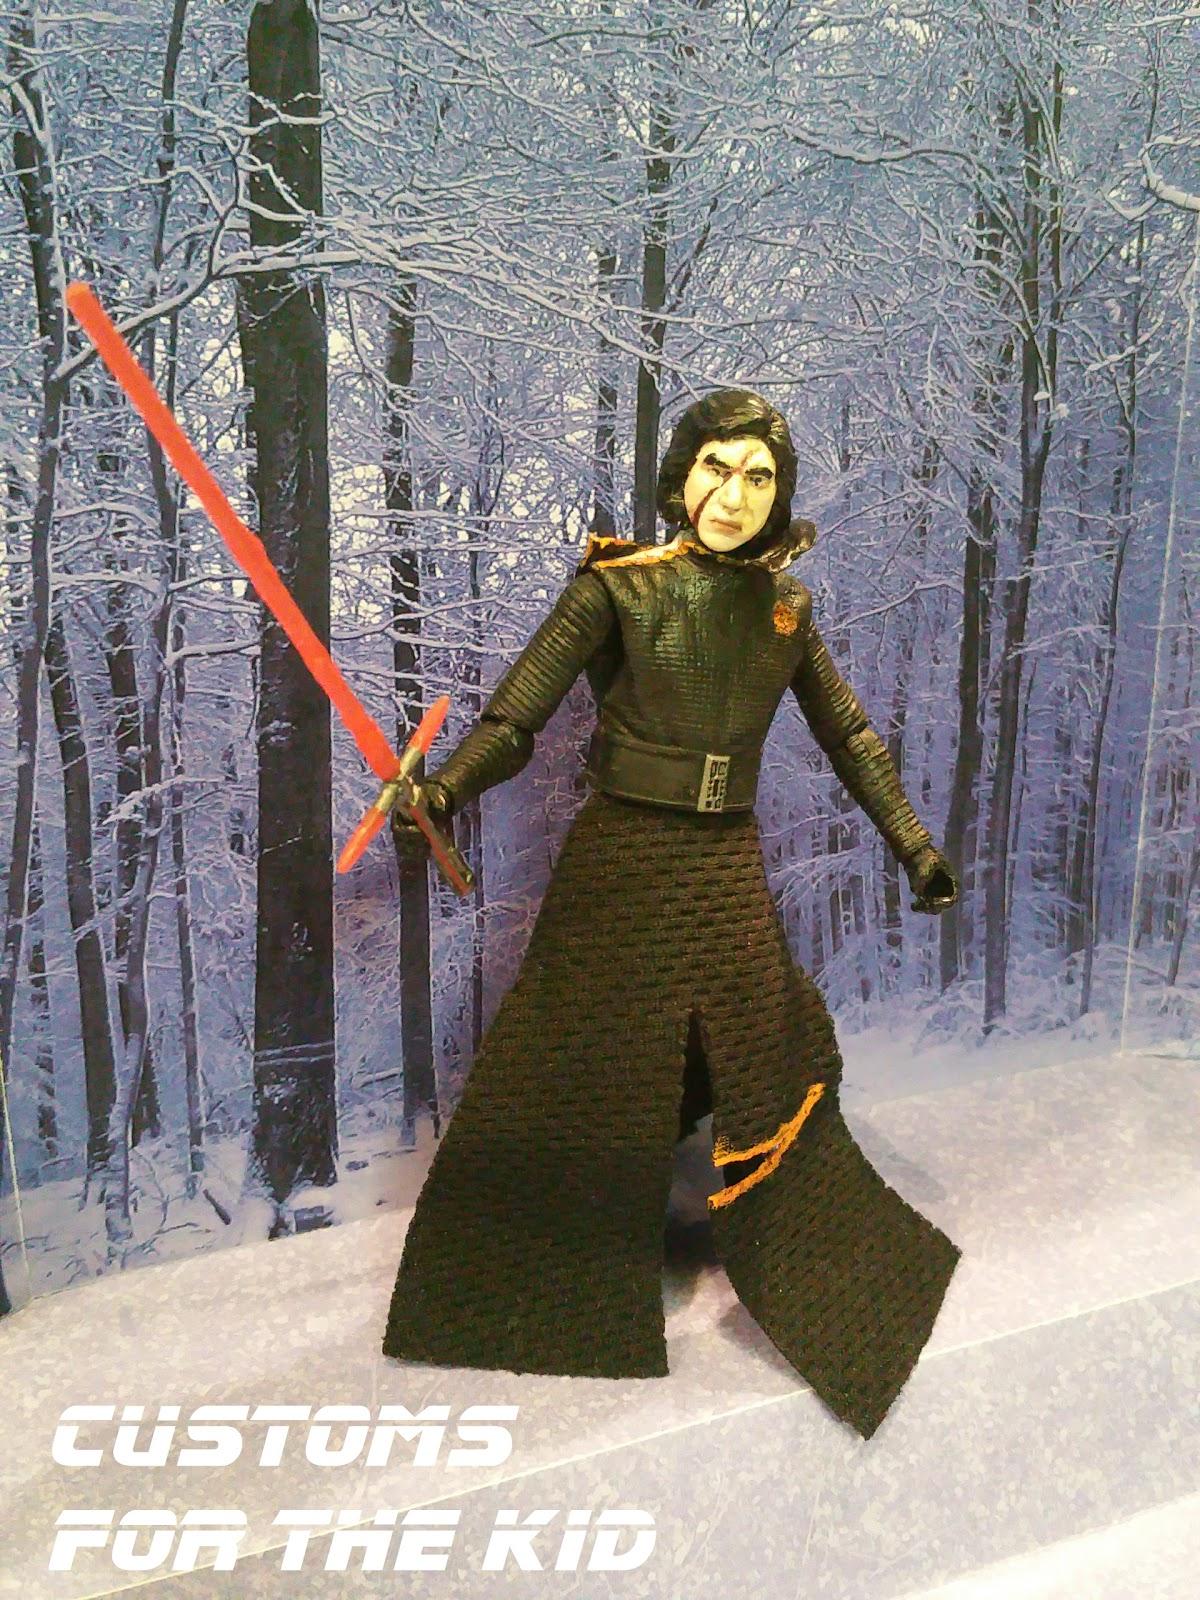 Star Wars Customs For The Kid Battle Damaged Kylo Ren